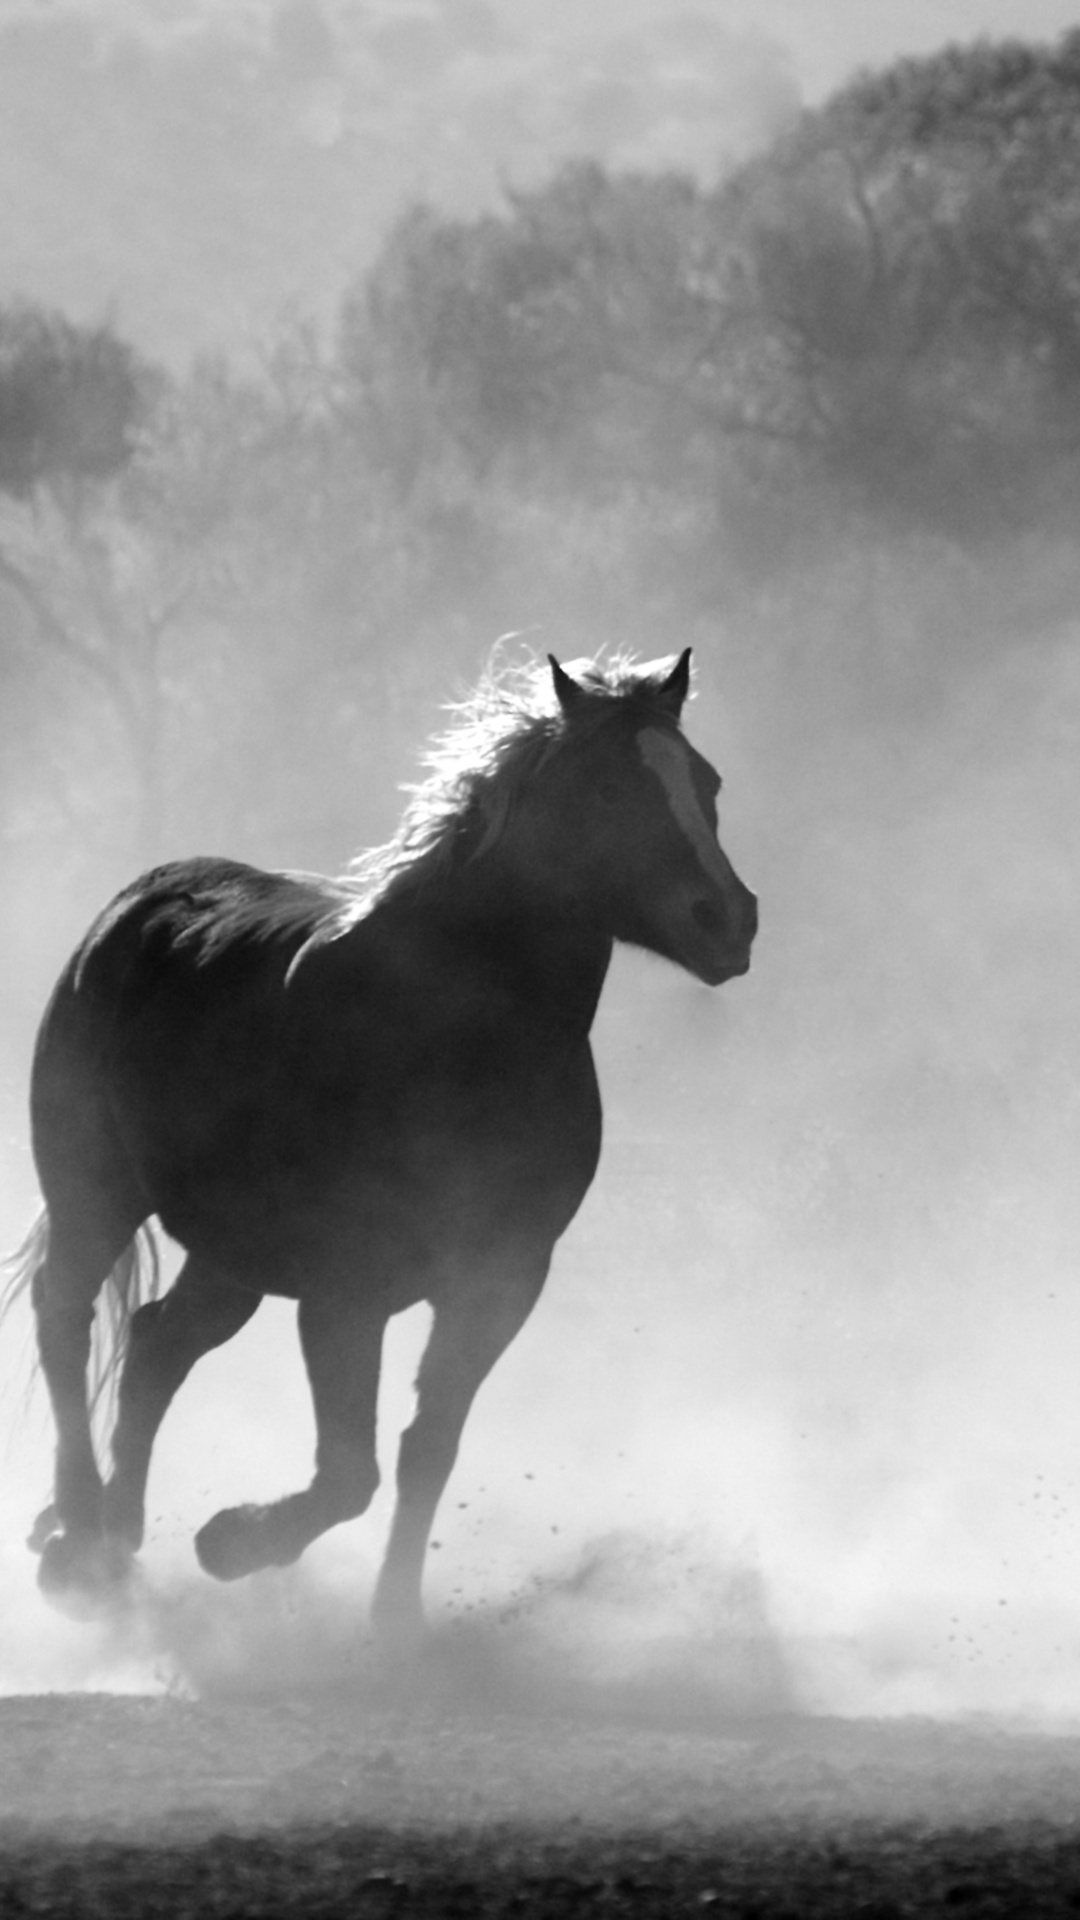 1080x1920 Horses Running Dust Monochrome 4k Iphone 7 6s 6 Plus